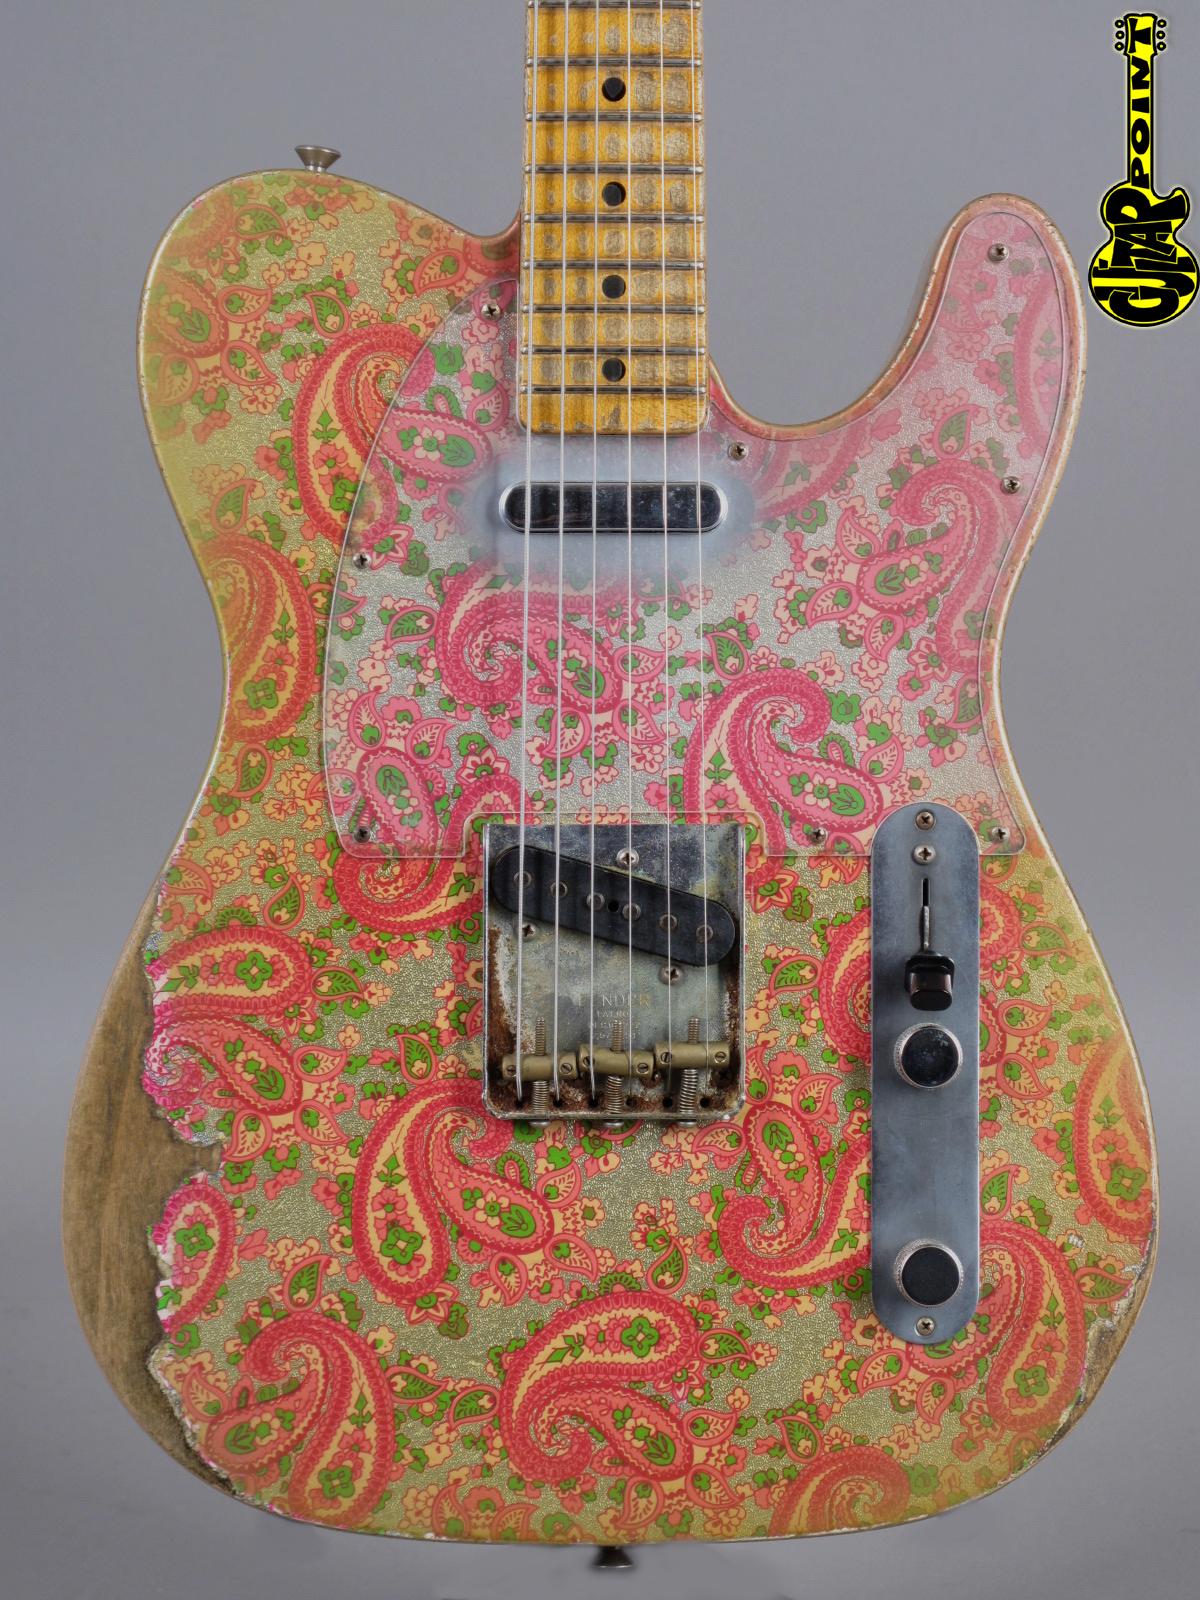 2017 Fender Custom Shop Dale Wilson Masterbuilt '68 Telecaster Paisley Relic